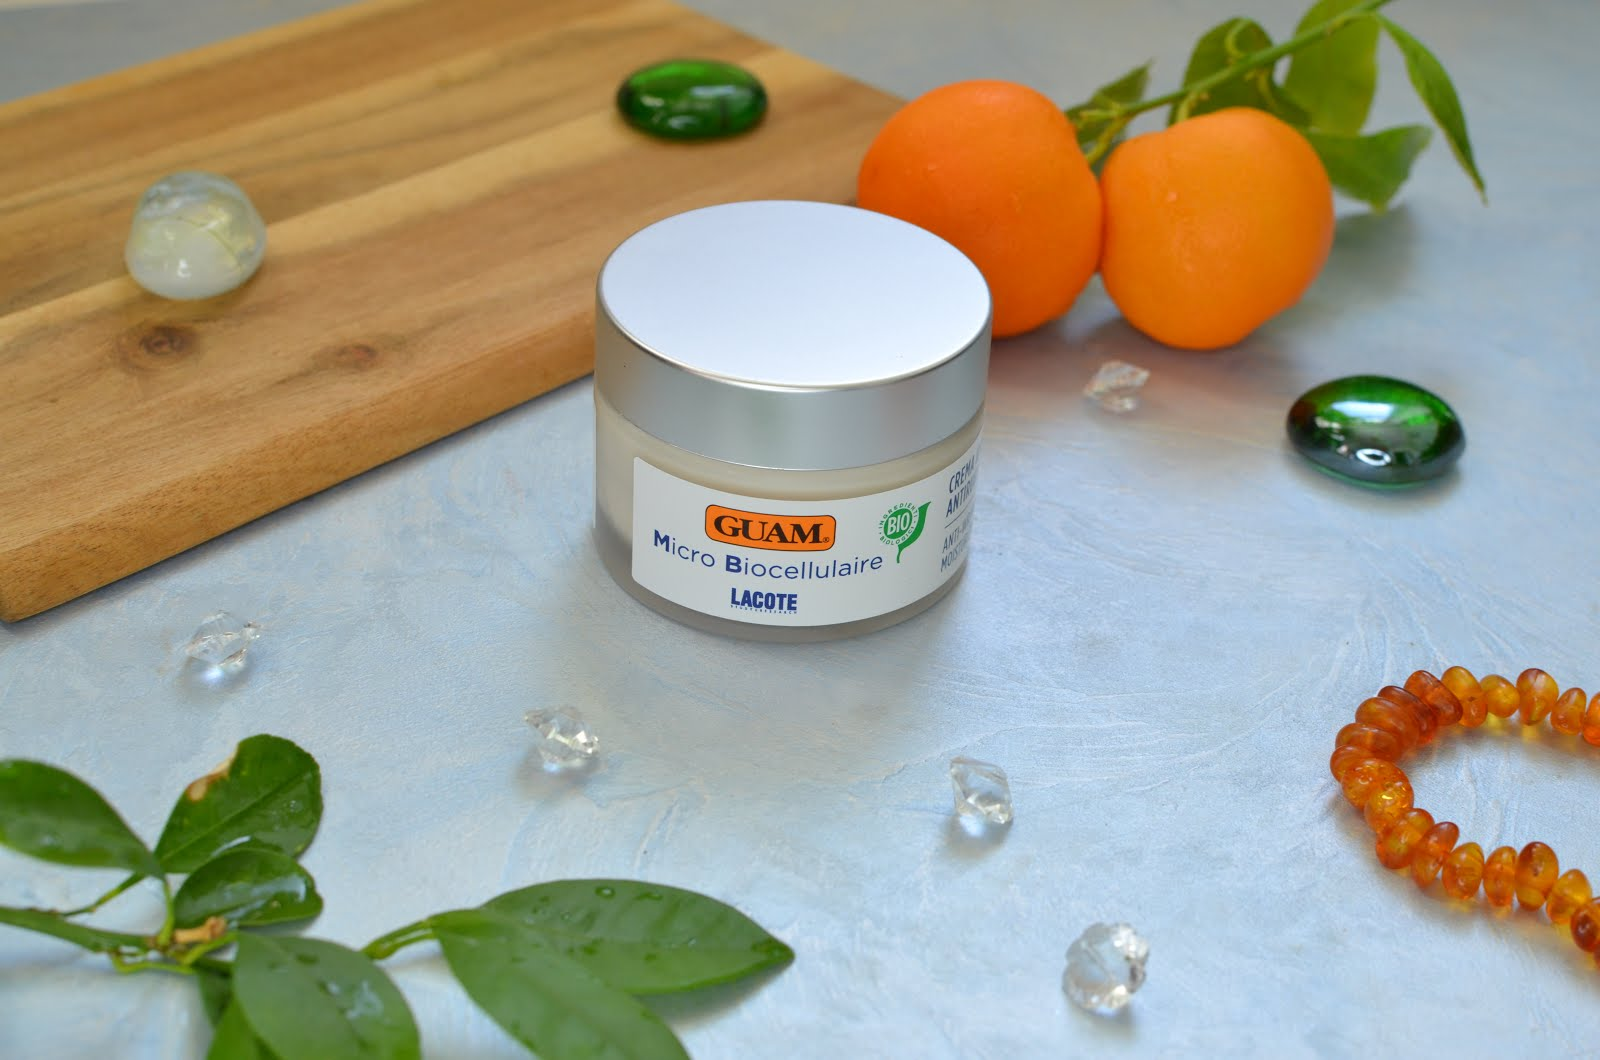 GUAM Micro Biocellulaire Anti-Wrinkle Lifting Cream увлажняющий лифтинг-крем ORGANIC противовозрастного действия для лица